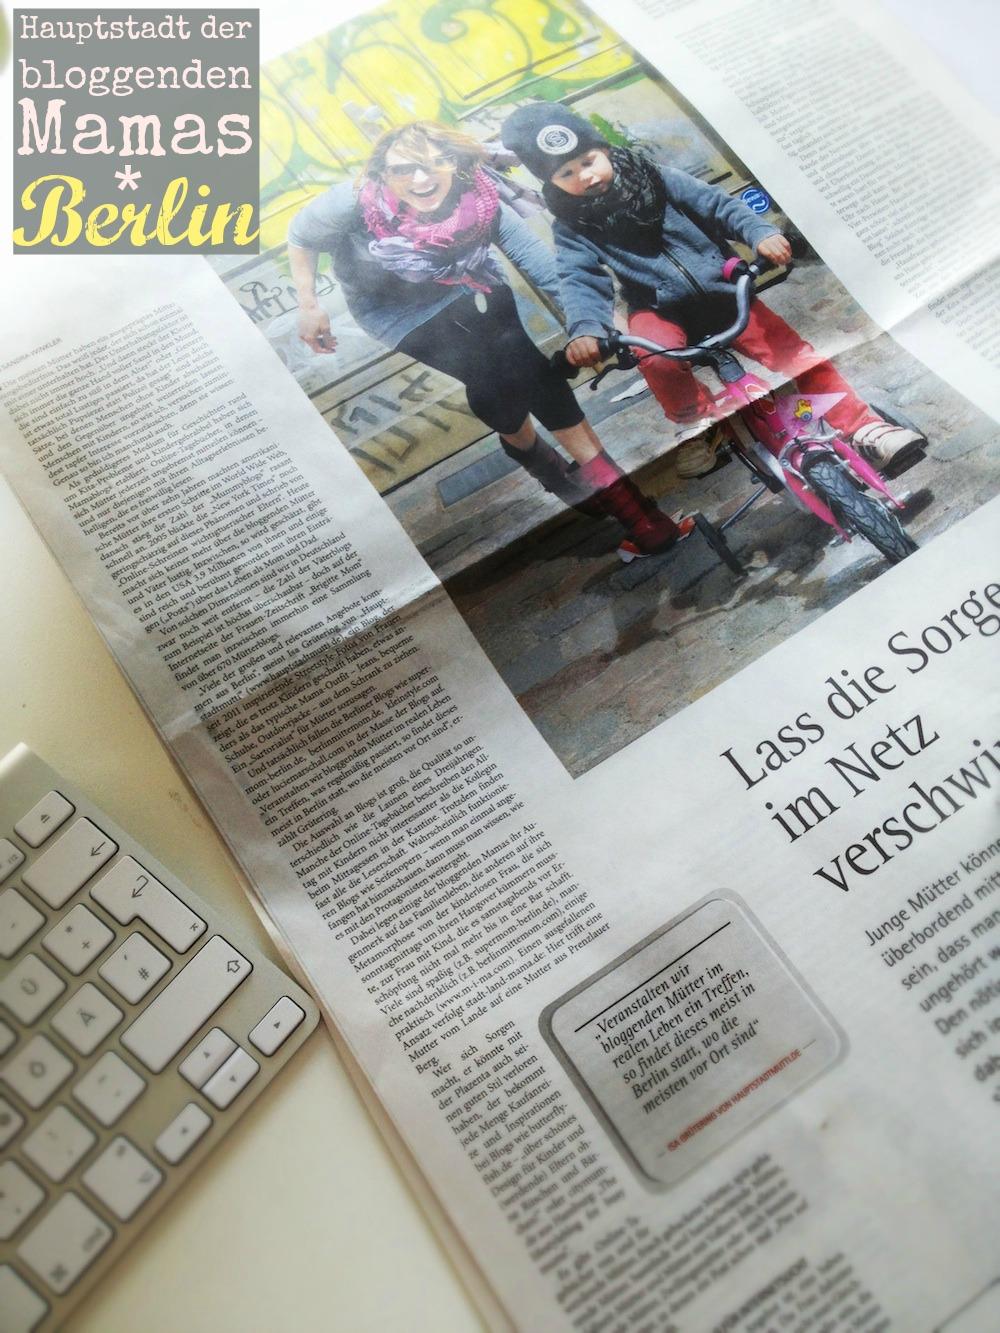 Berlin : Hauptstadt der bloggenden Mütter